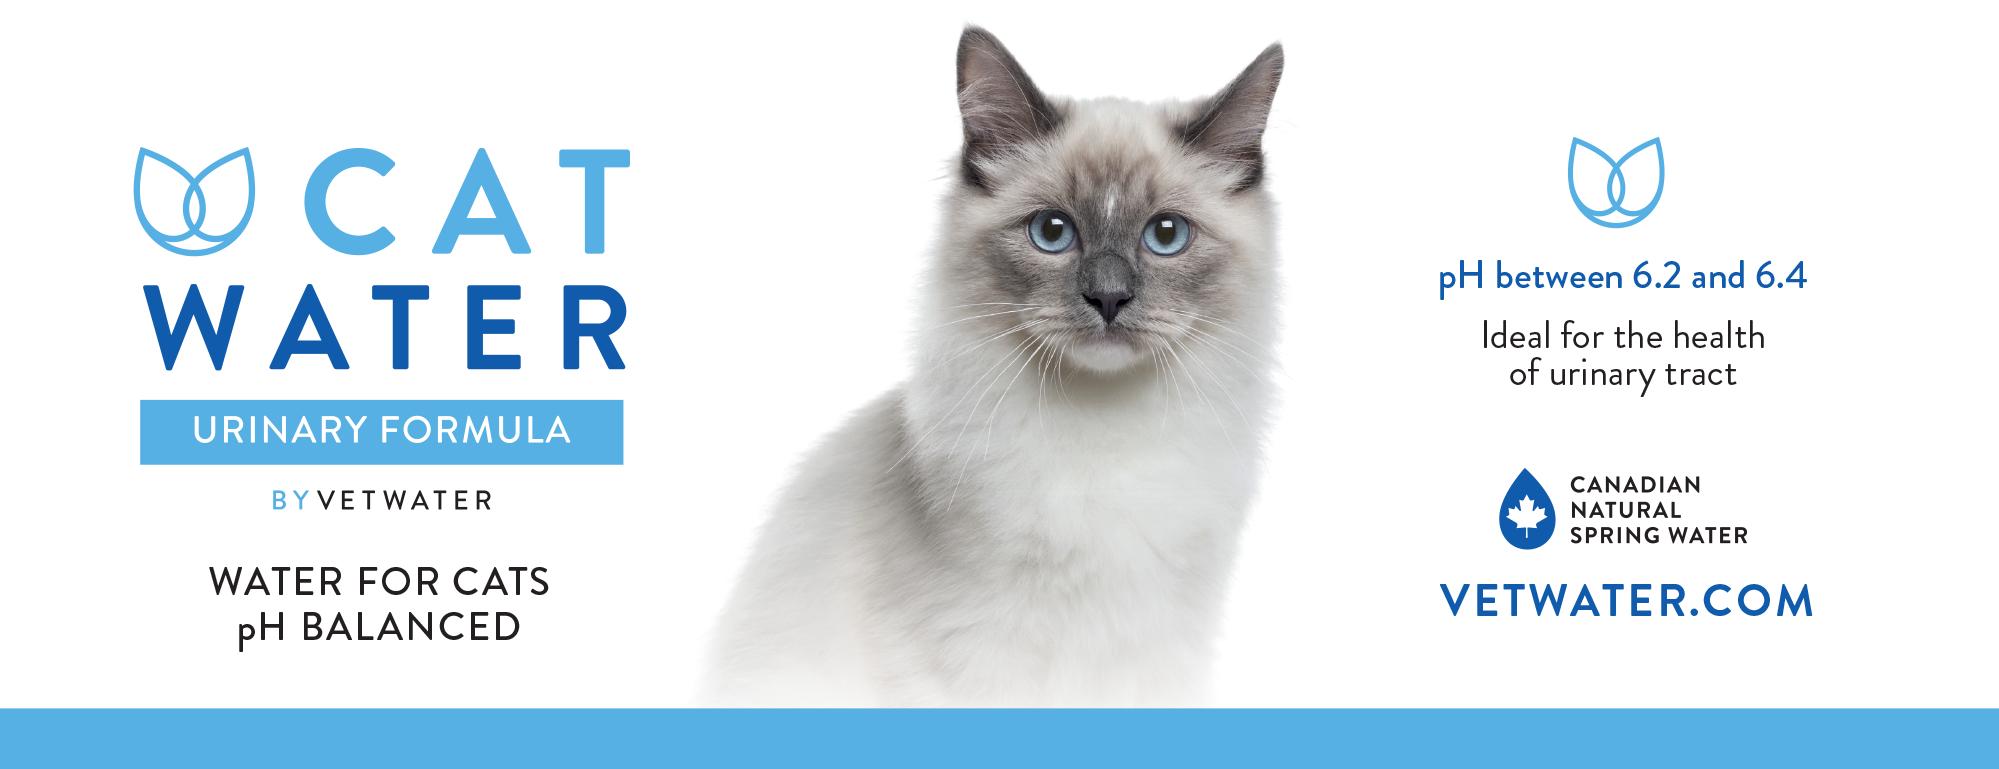 Cat Water Header image